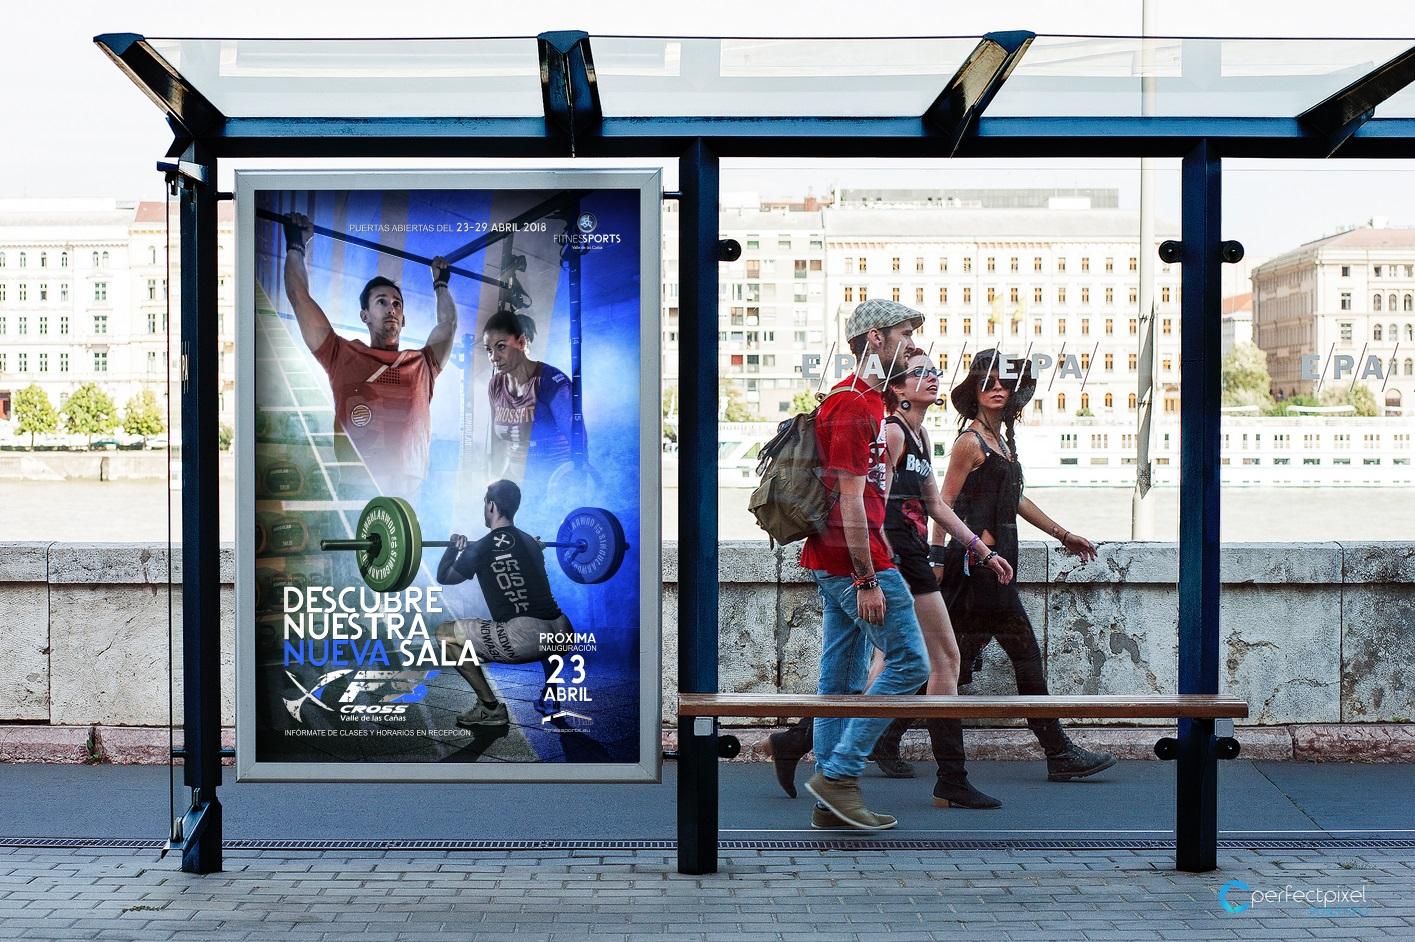 https://perfectpixel.es/wp-content/uploads/2018/04/Agencia-de-Publicidad-en-Madrid-Perfect-Pixel-Dise%C3%B1o-Cartel-Publicitario-Bus.jpg